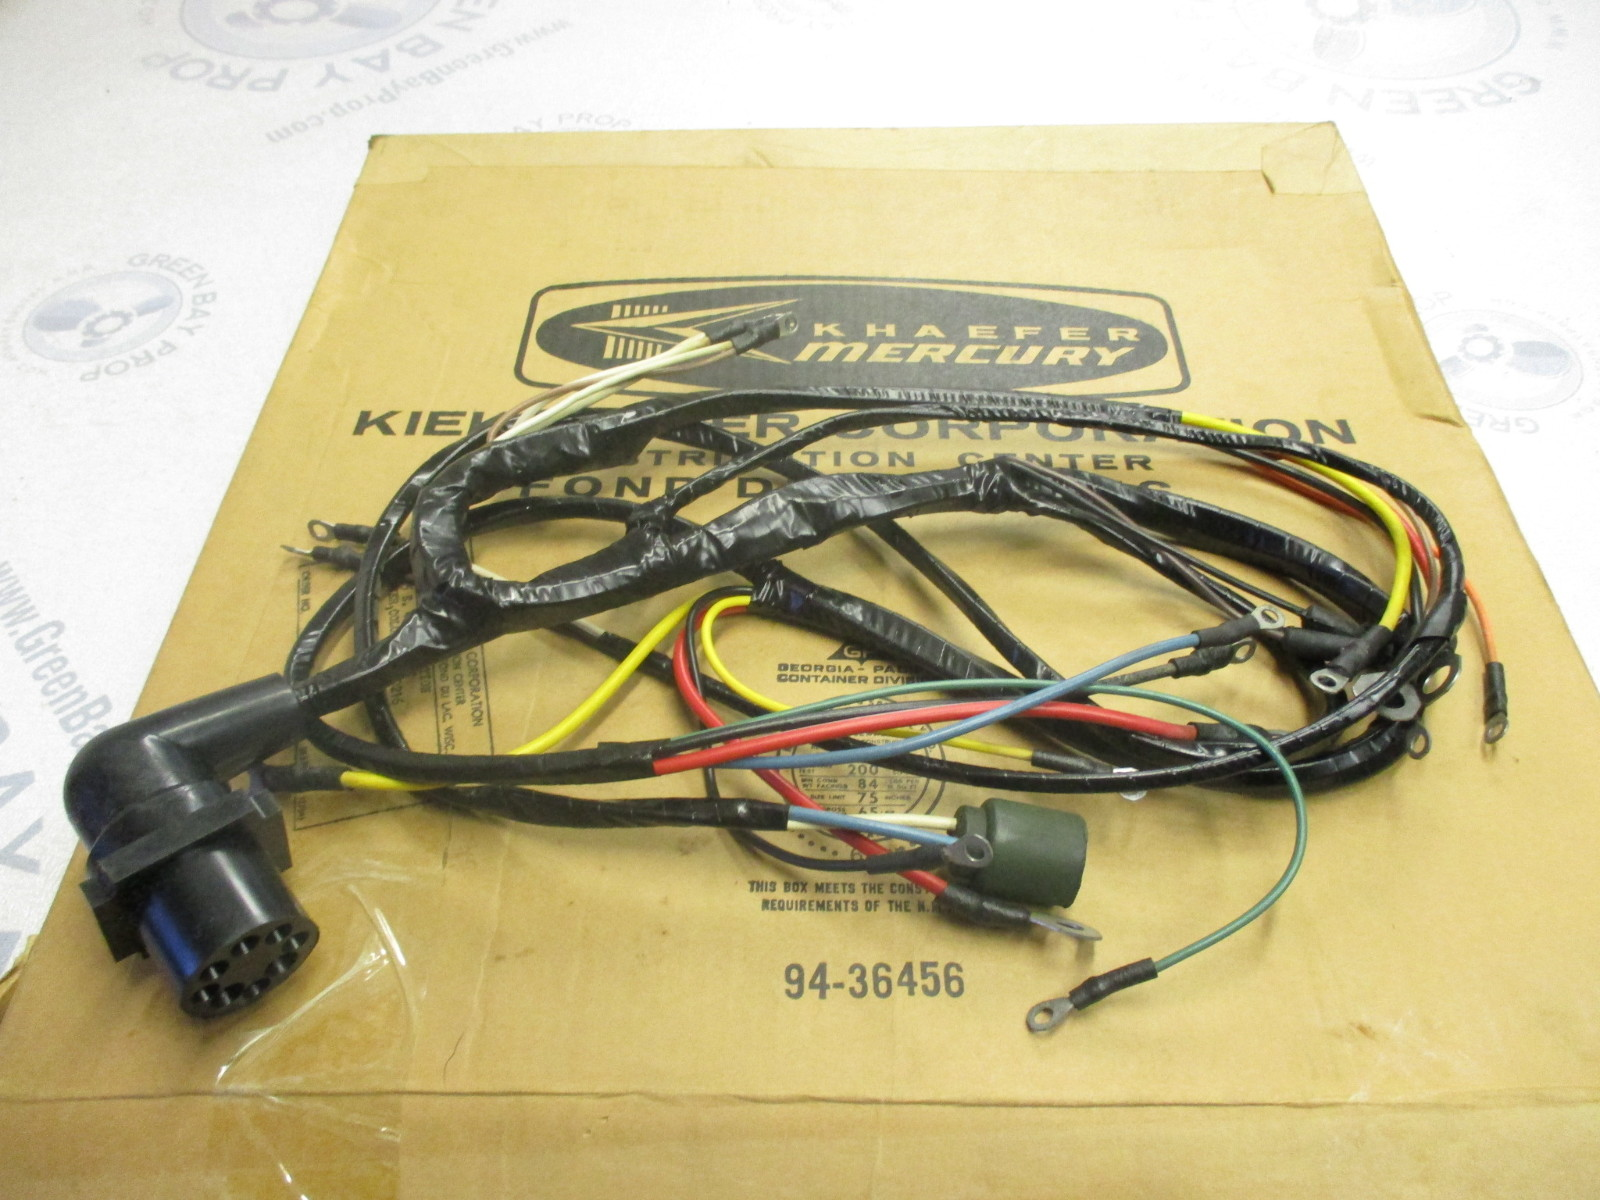 39544a1 Mercury Kiekhaefer Engine Motor Marine Wire